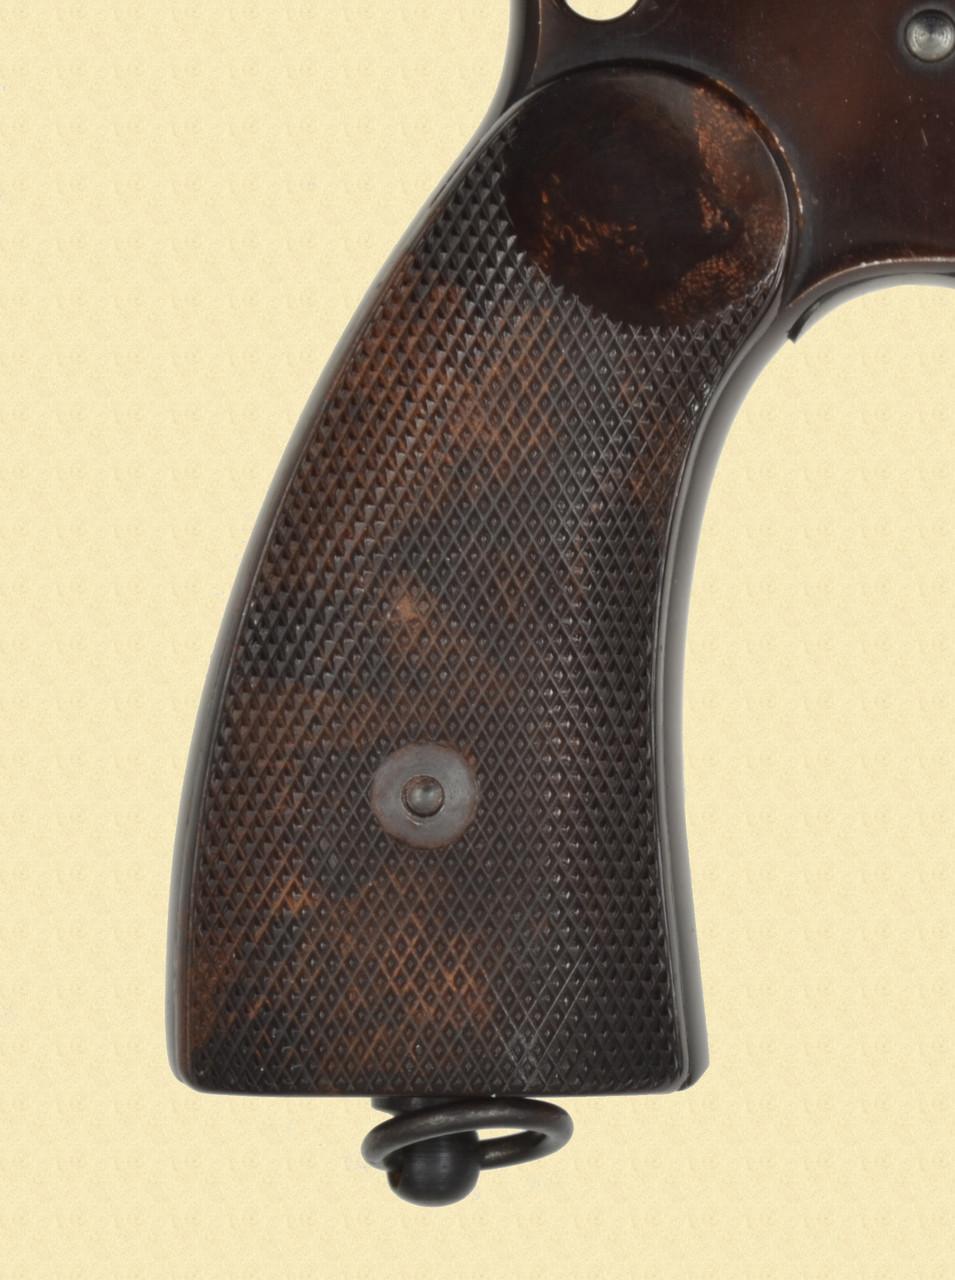 WALTHER GERMAN NAVY FLAIR GUN ZELLA-MEHLIS - C32642